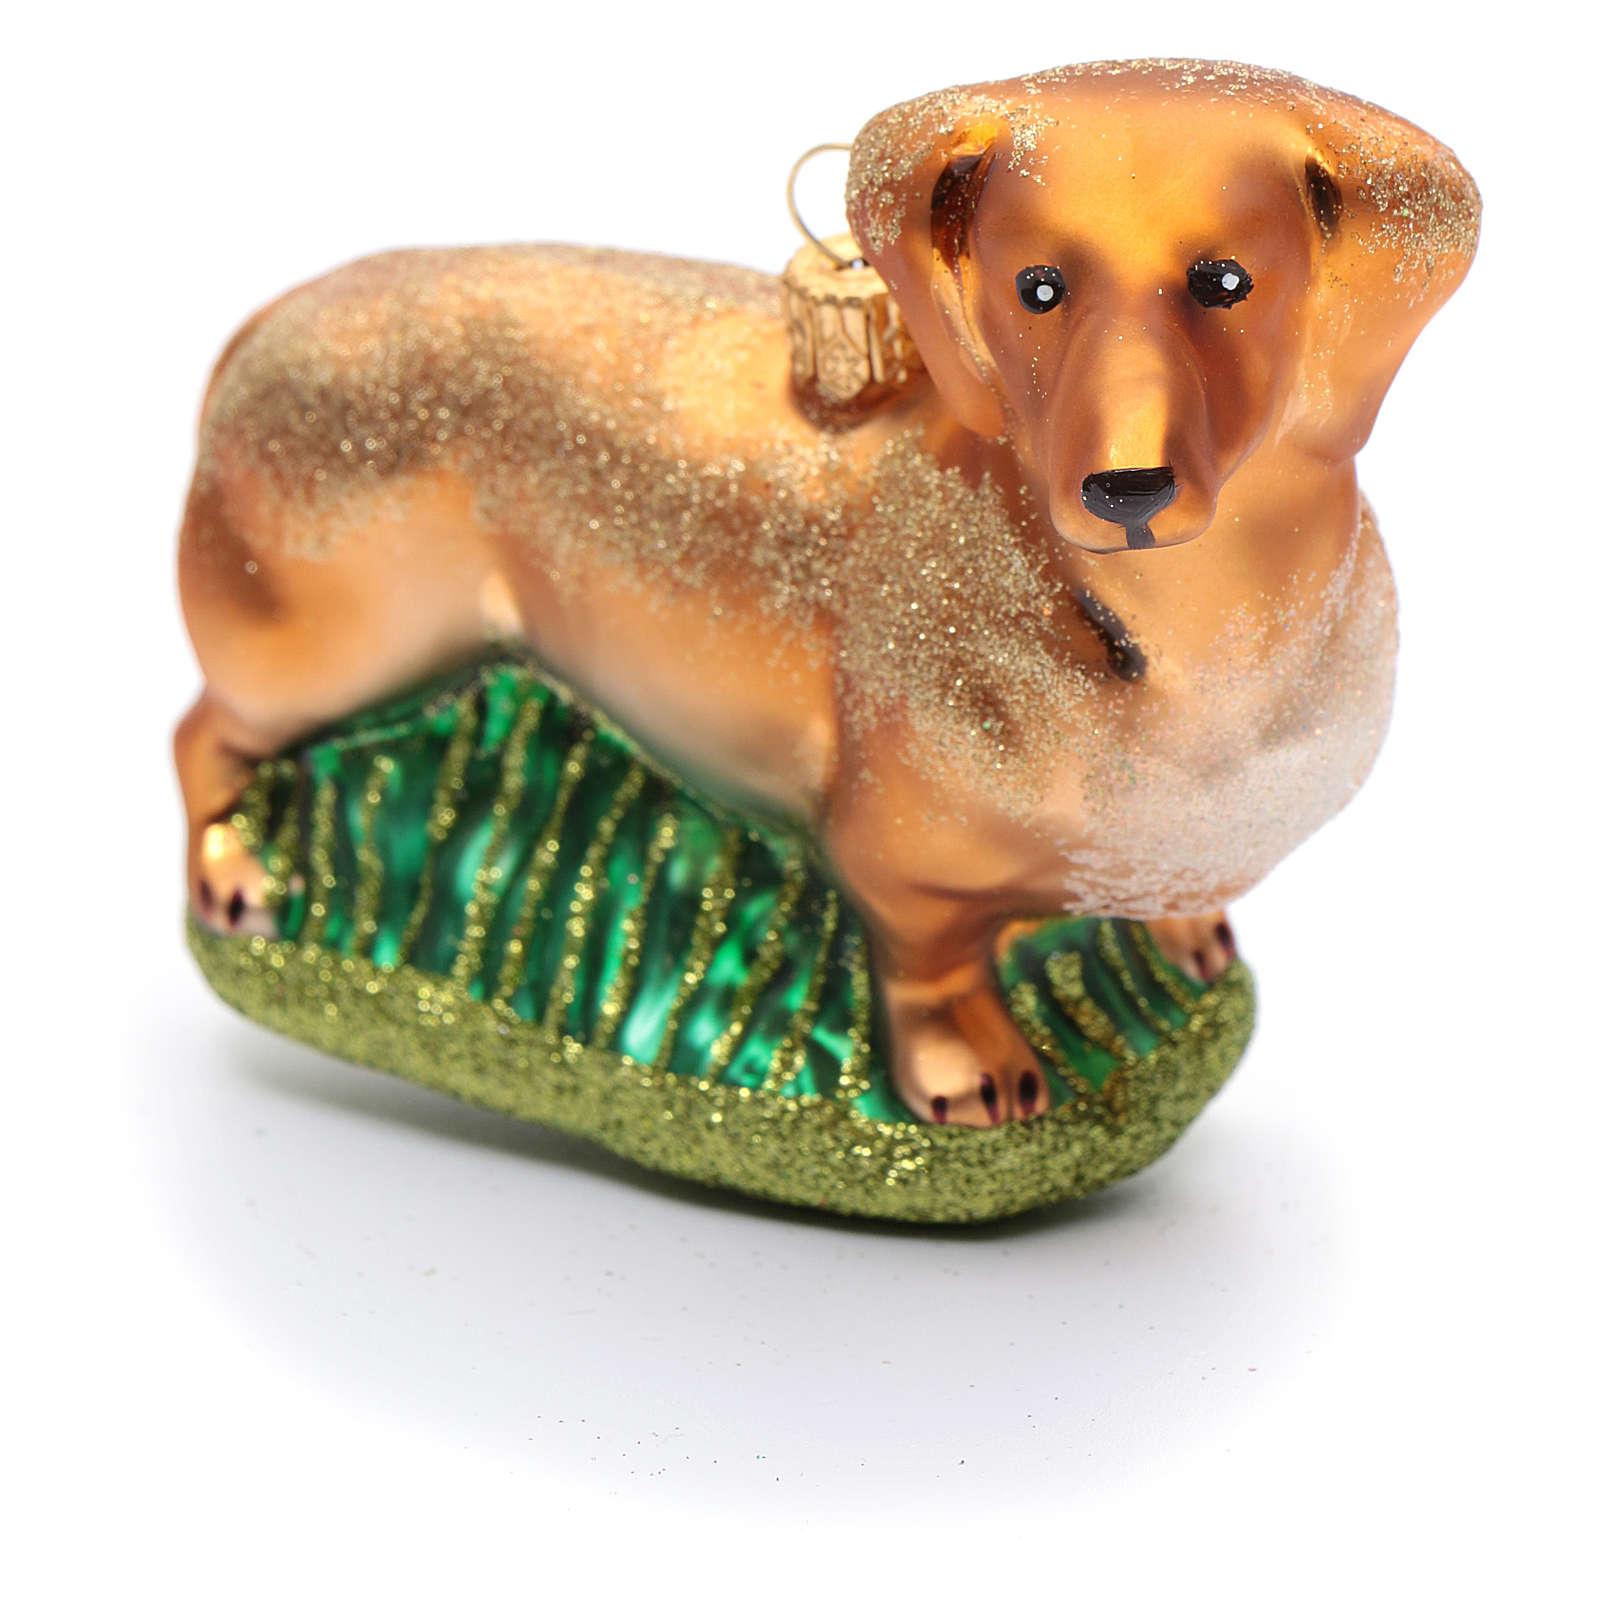 Basset Hound adorno vidrio soplado Árbol de Navidad 4